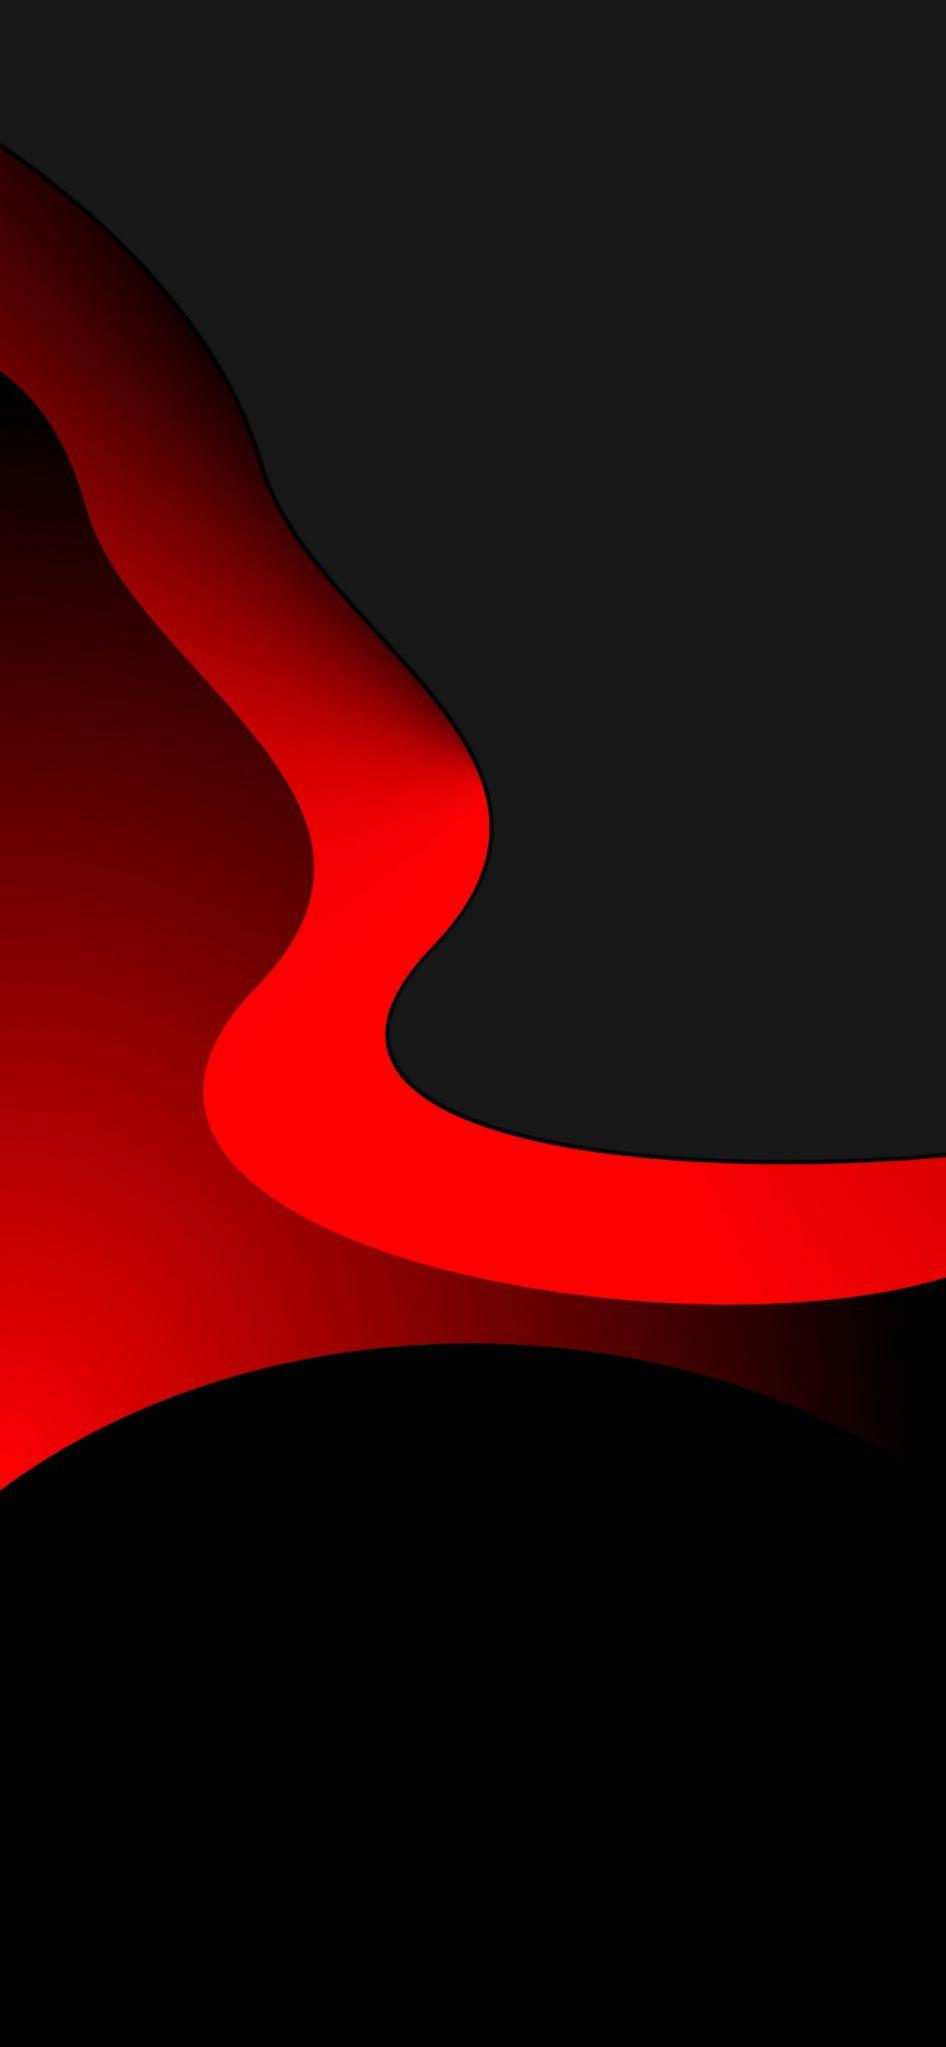 Hotspot4u Art Graphic Wallpapers Designer Wallpaper Display Live Wallpaper Iphone 7 Backgrounds Phone Wallpapers